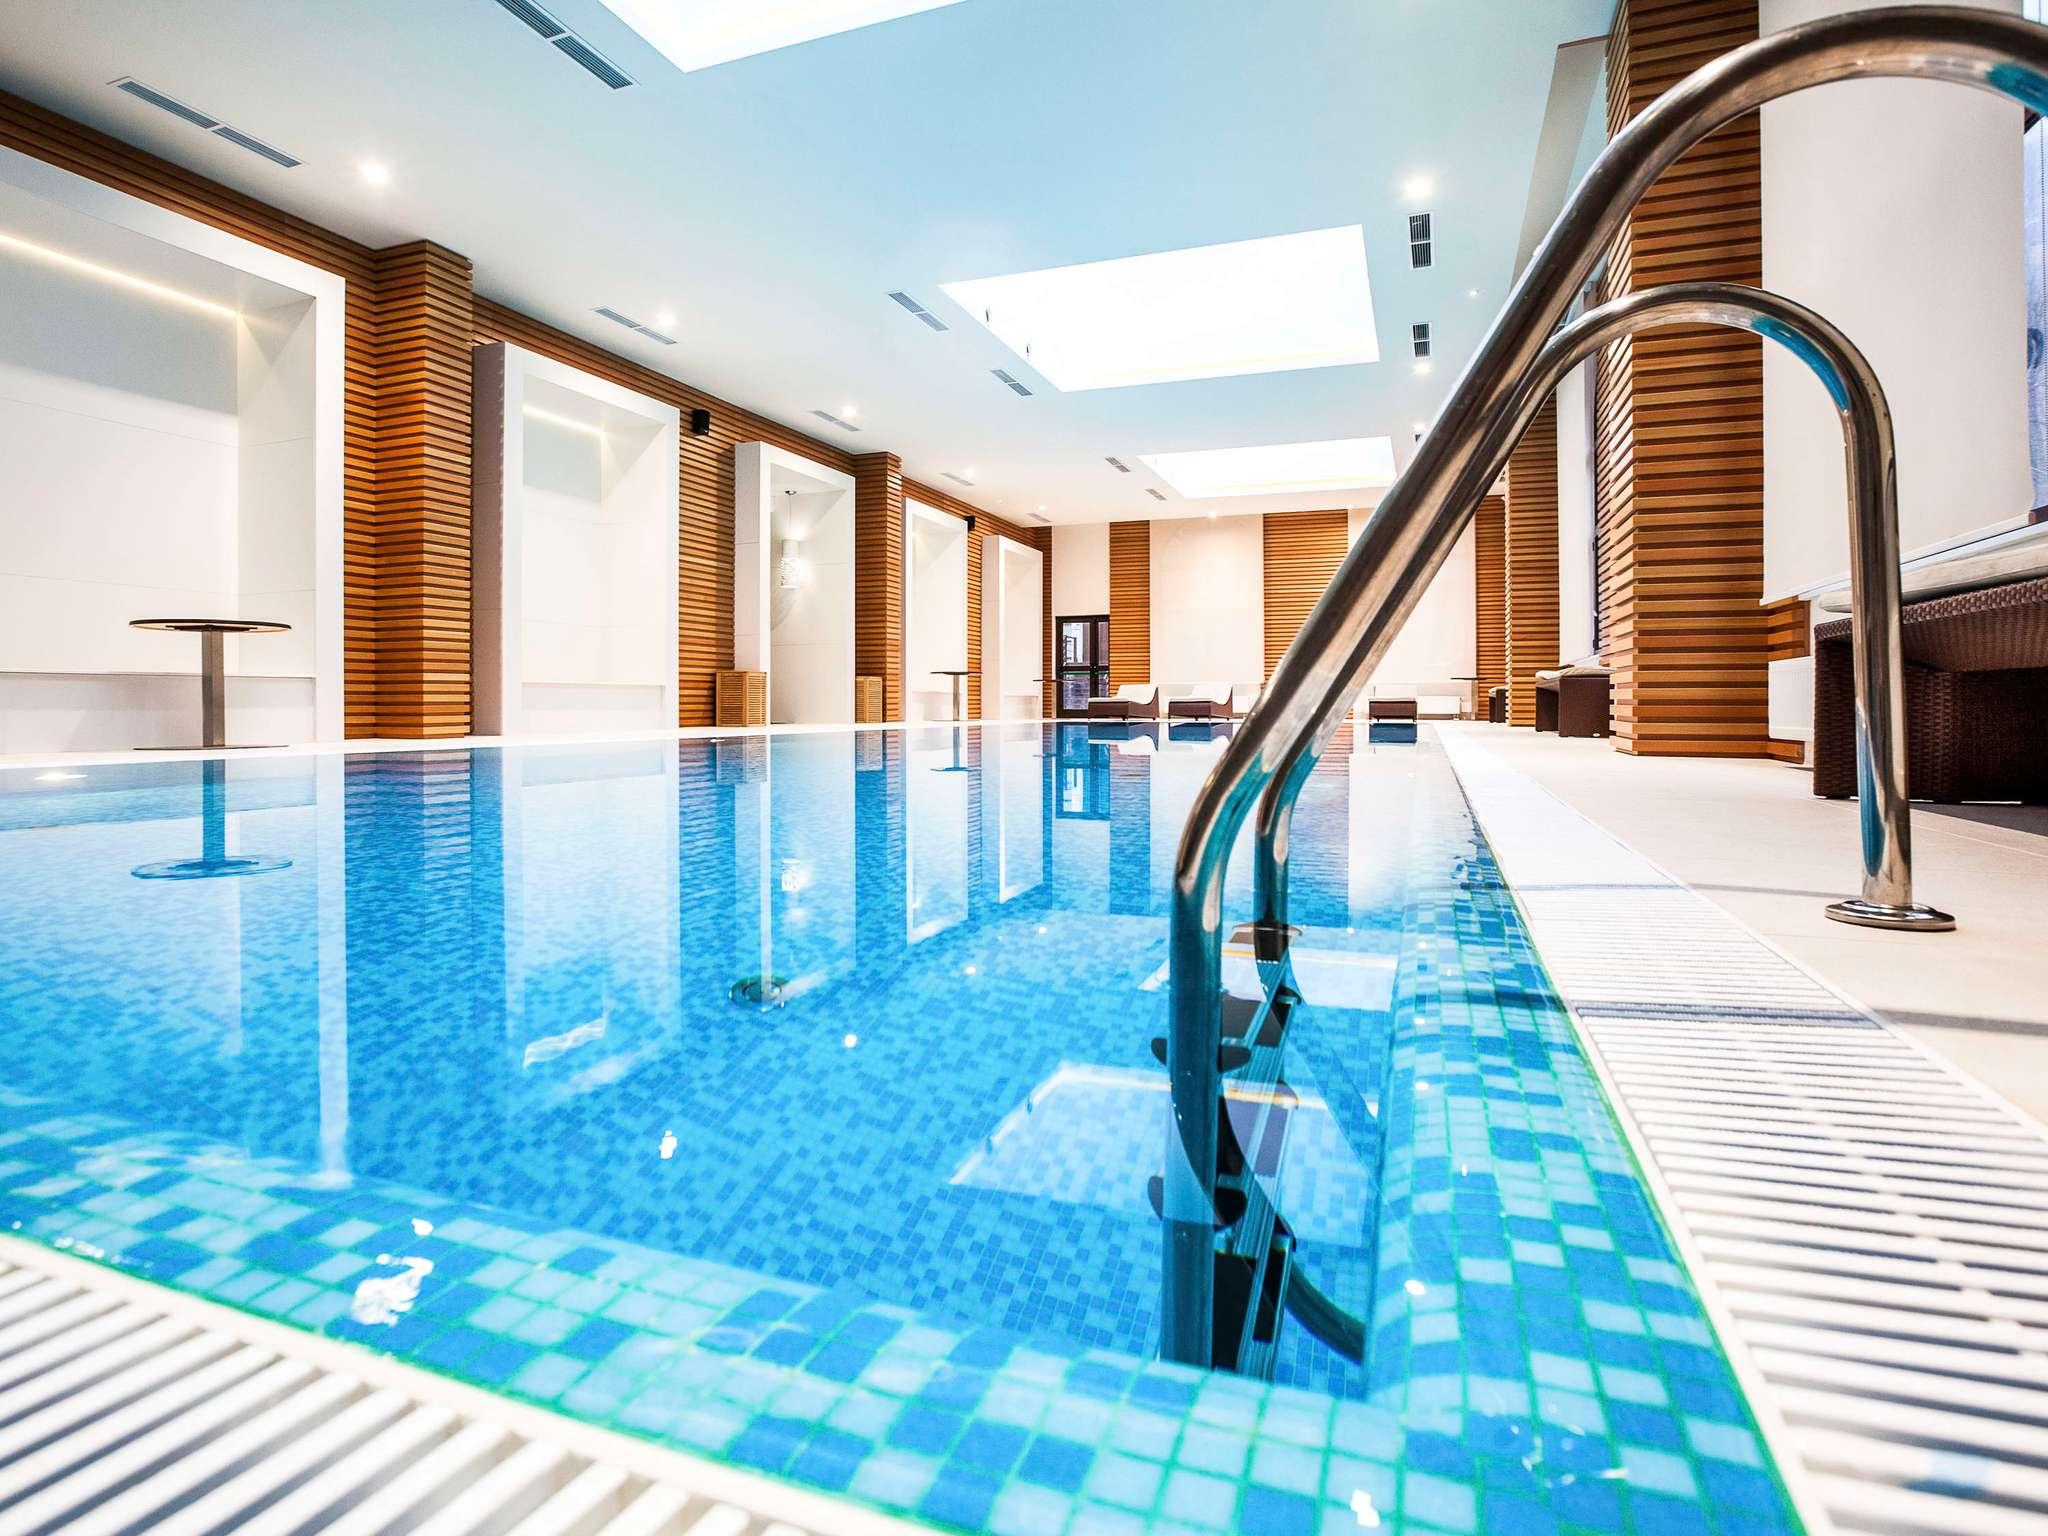 Hotel - Mercure Rosa Khutor